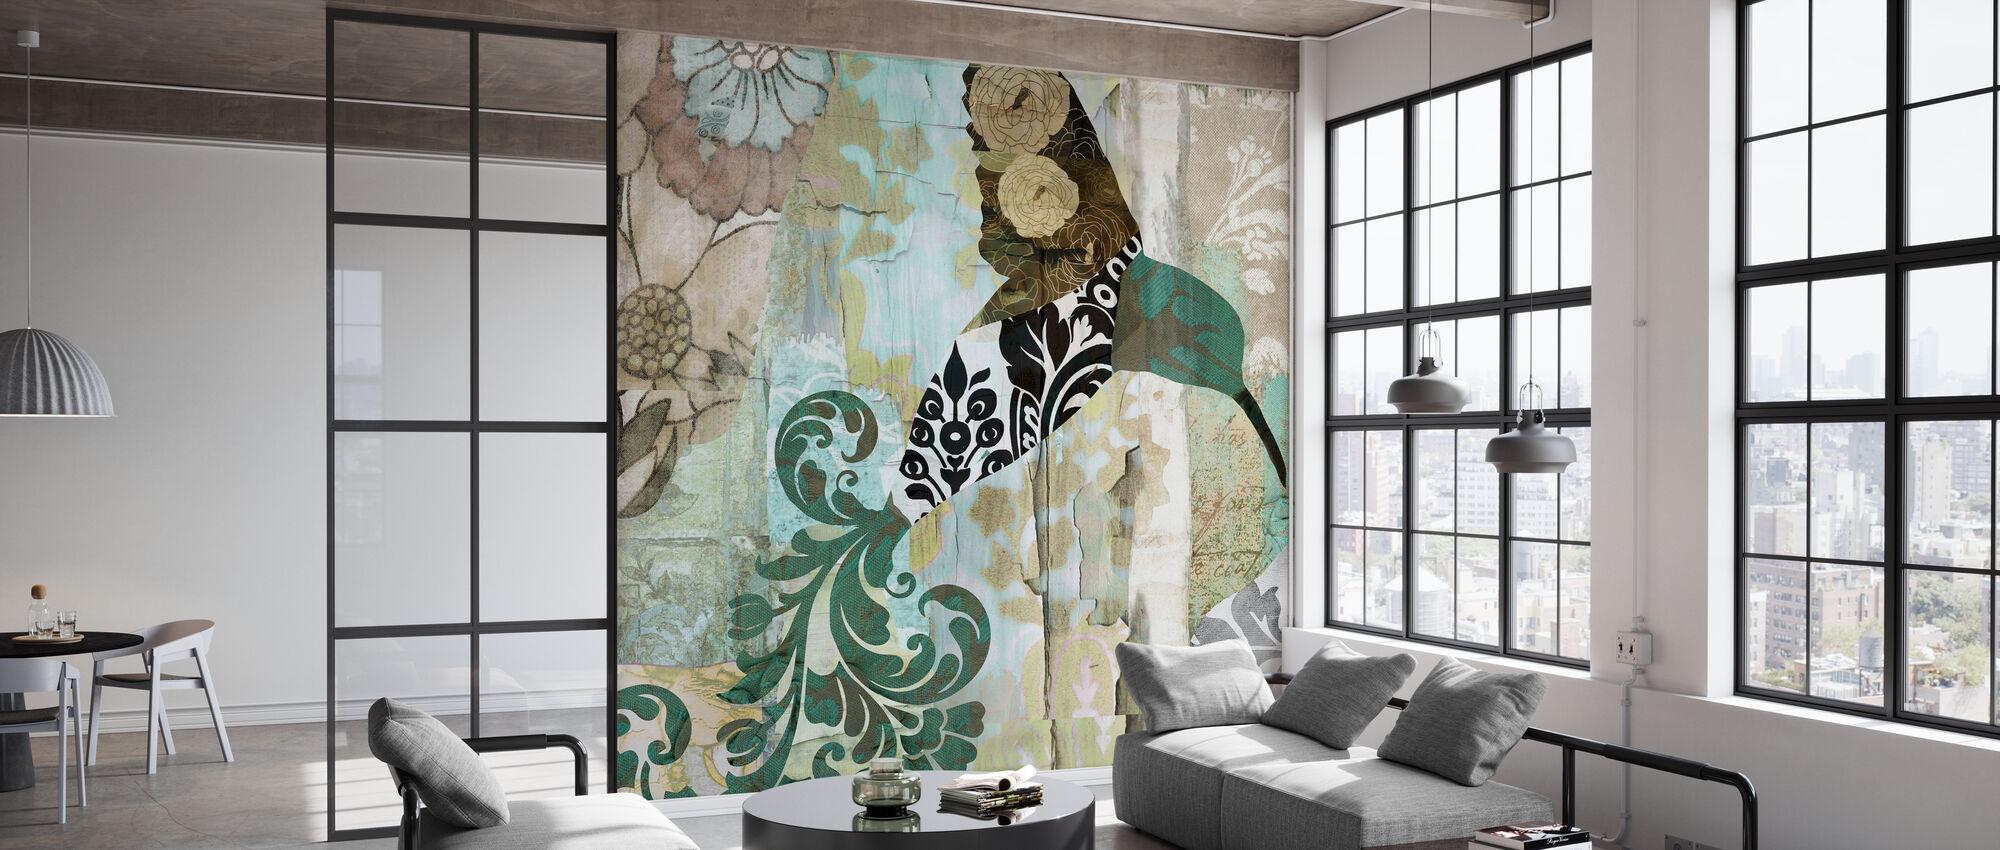 Patterns - Wallpaper - Office